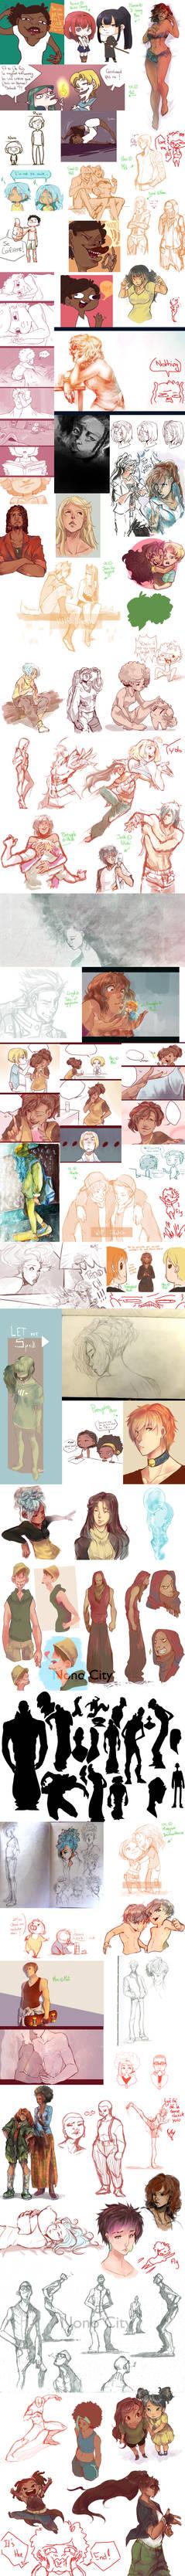 Sketch dump 5